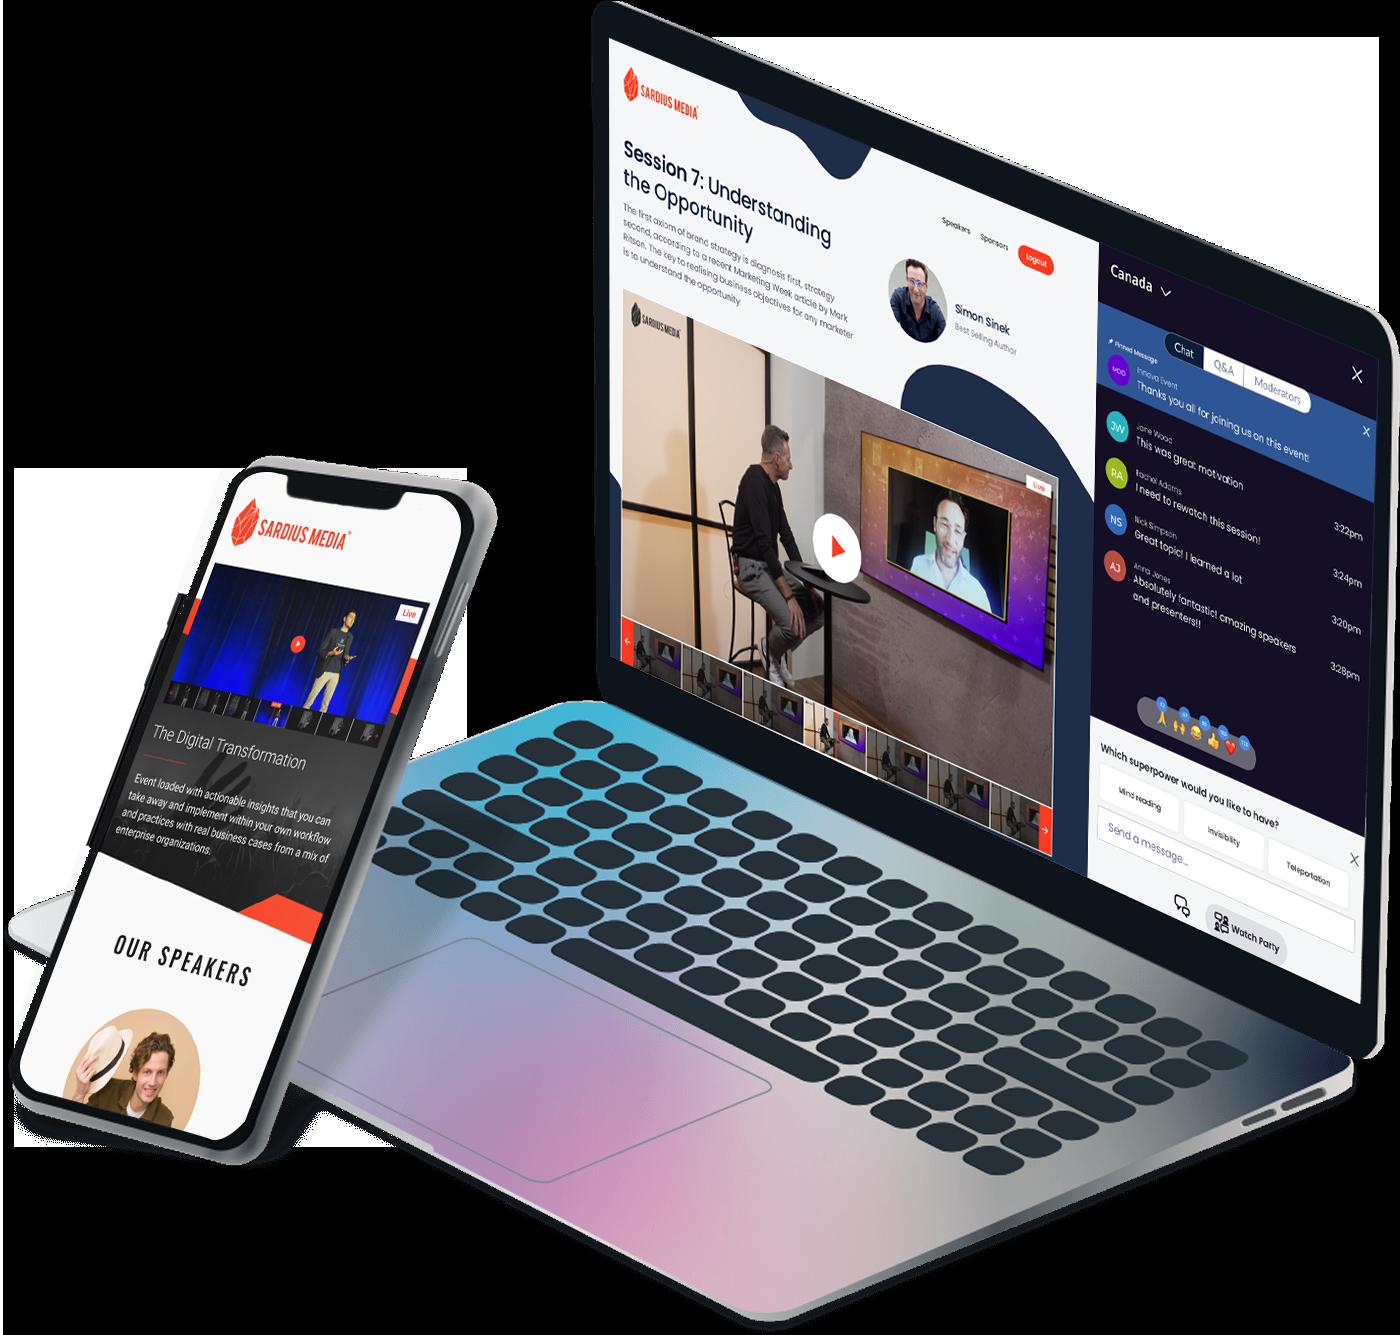 Sardius Media platform on computer and phone